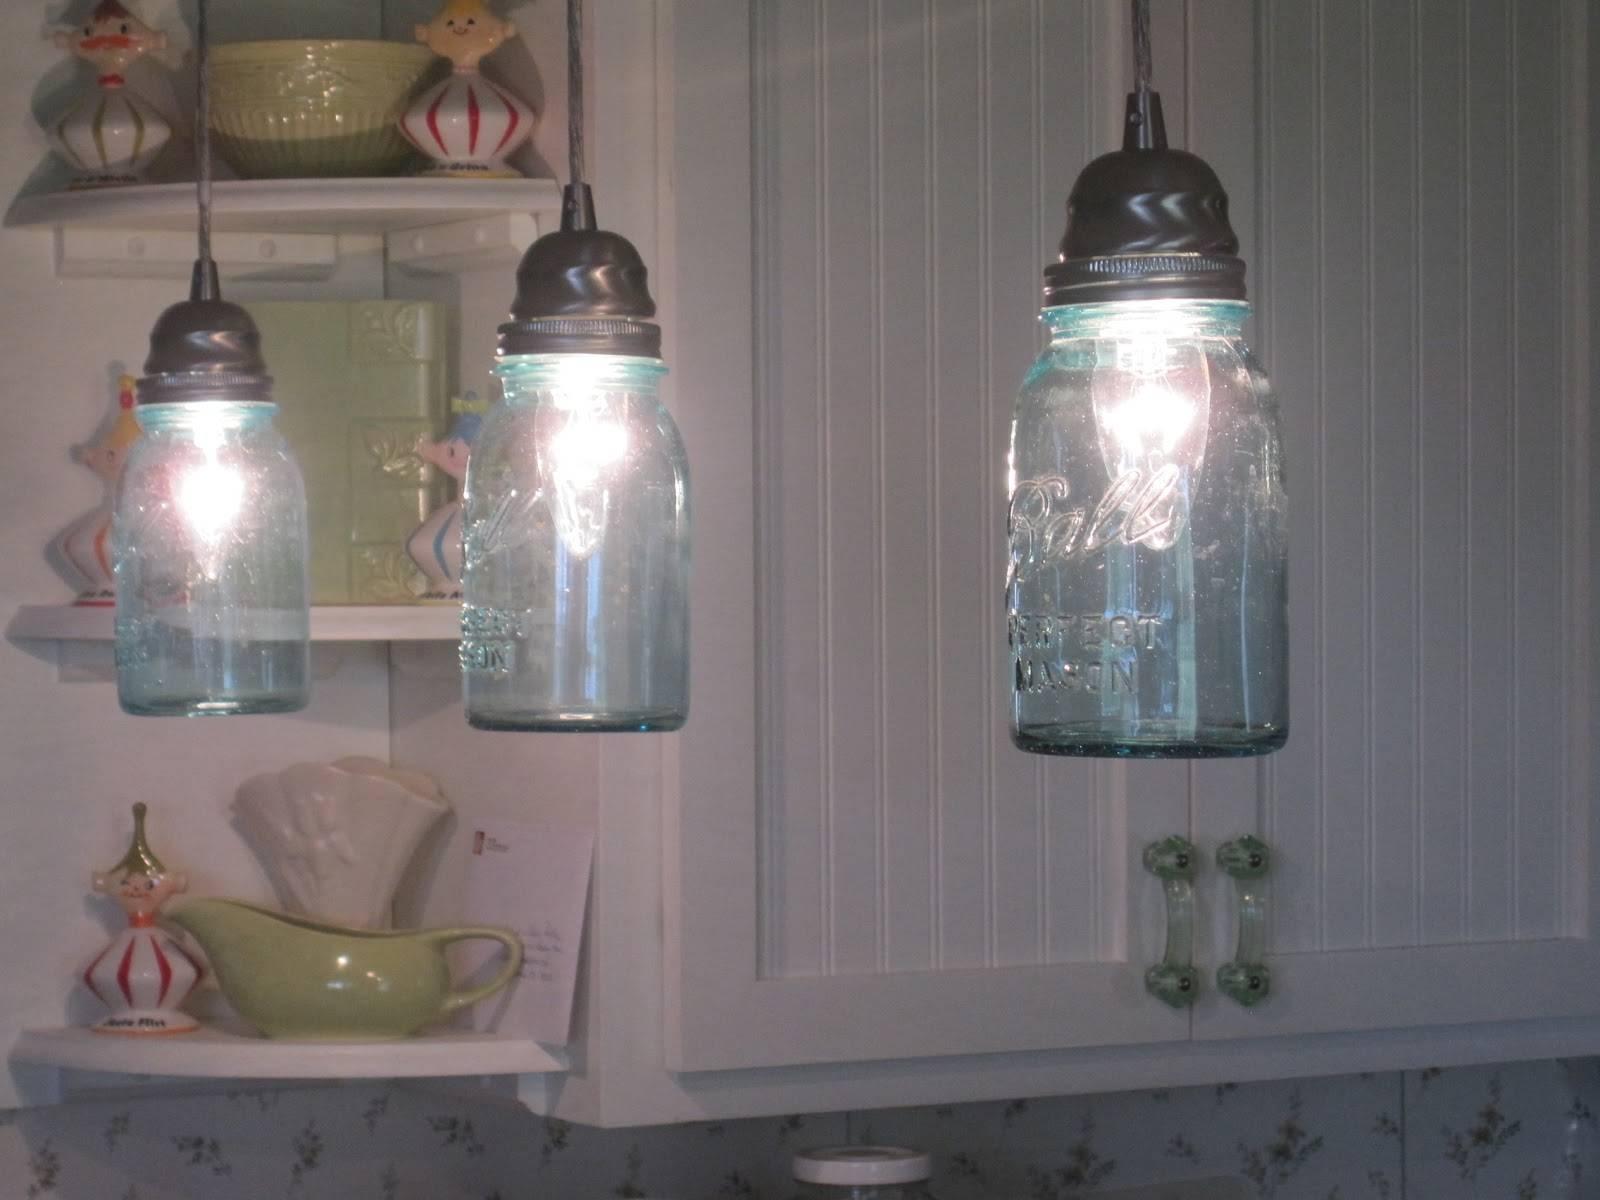 Fresh Buy Mason Jar Pendant Light #12127 within Ball Jar Pendant Lights (Image 9 of 15)